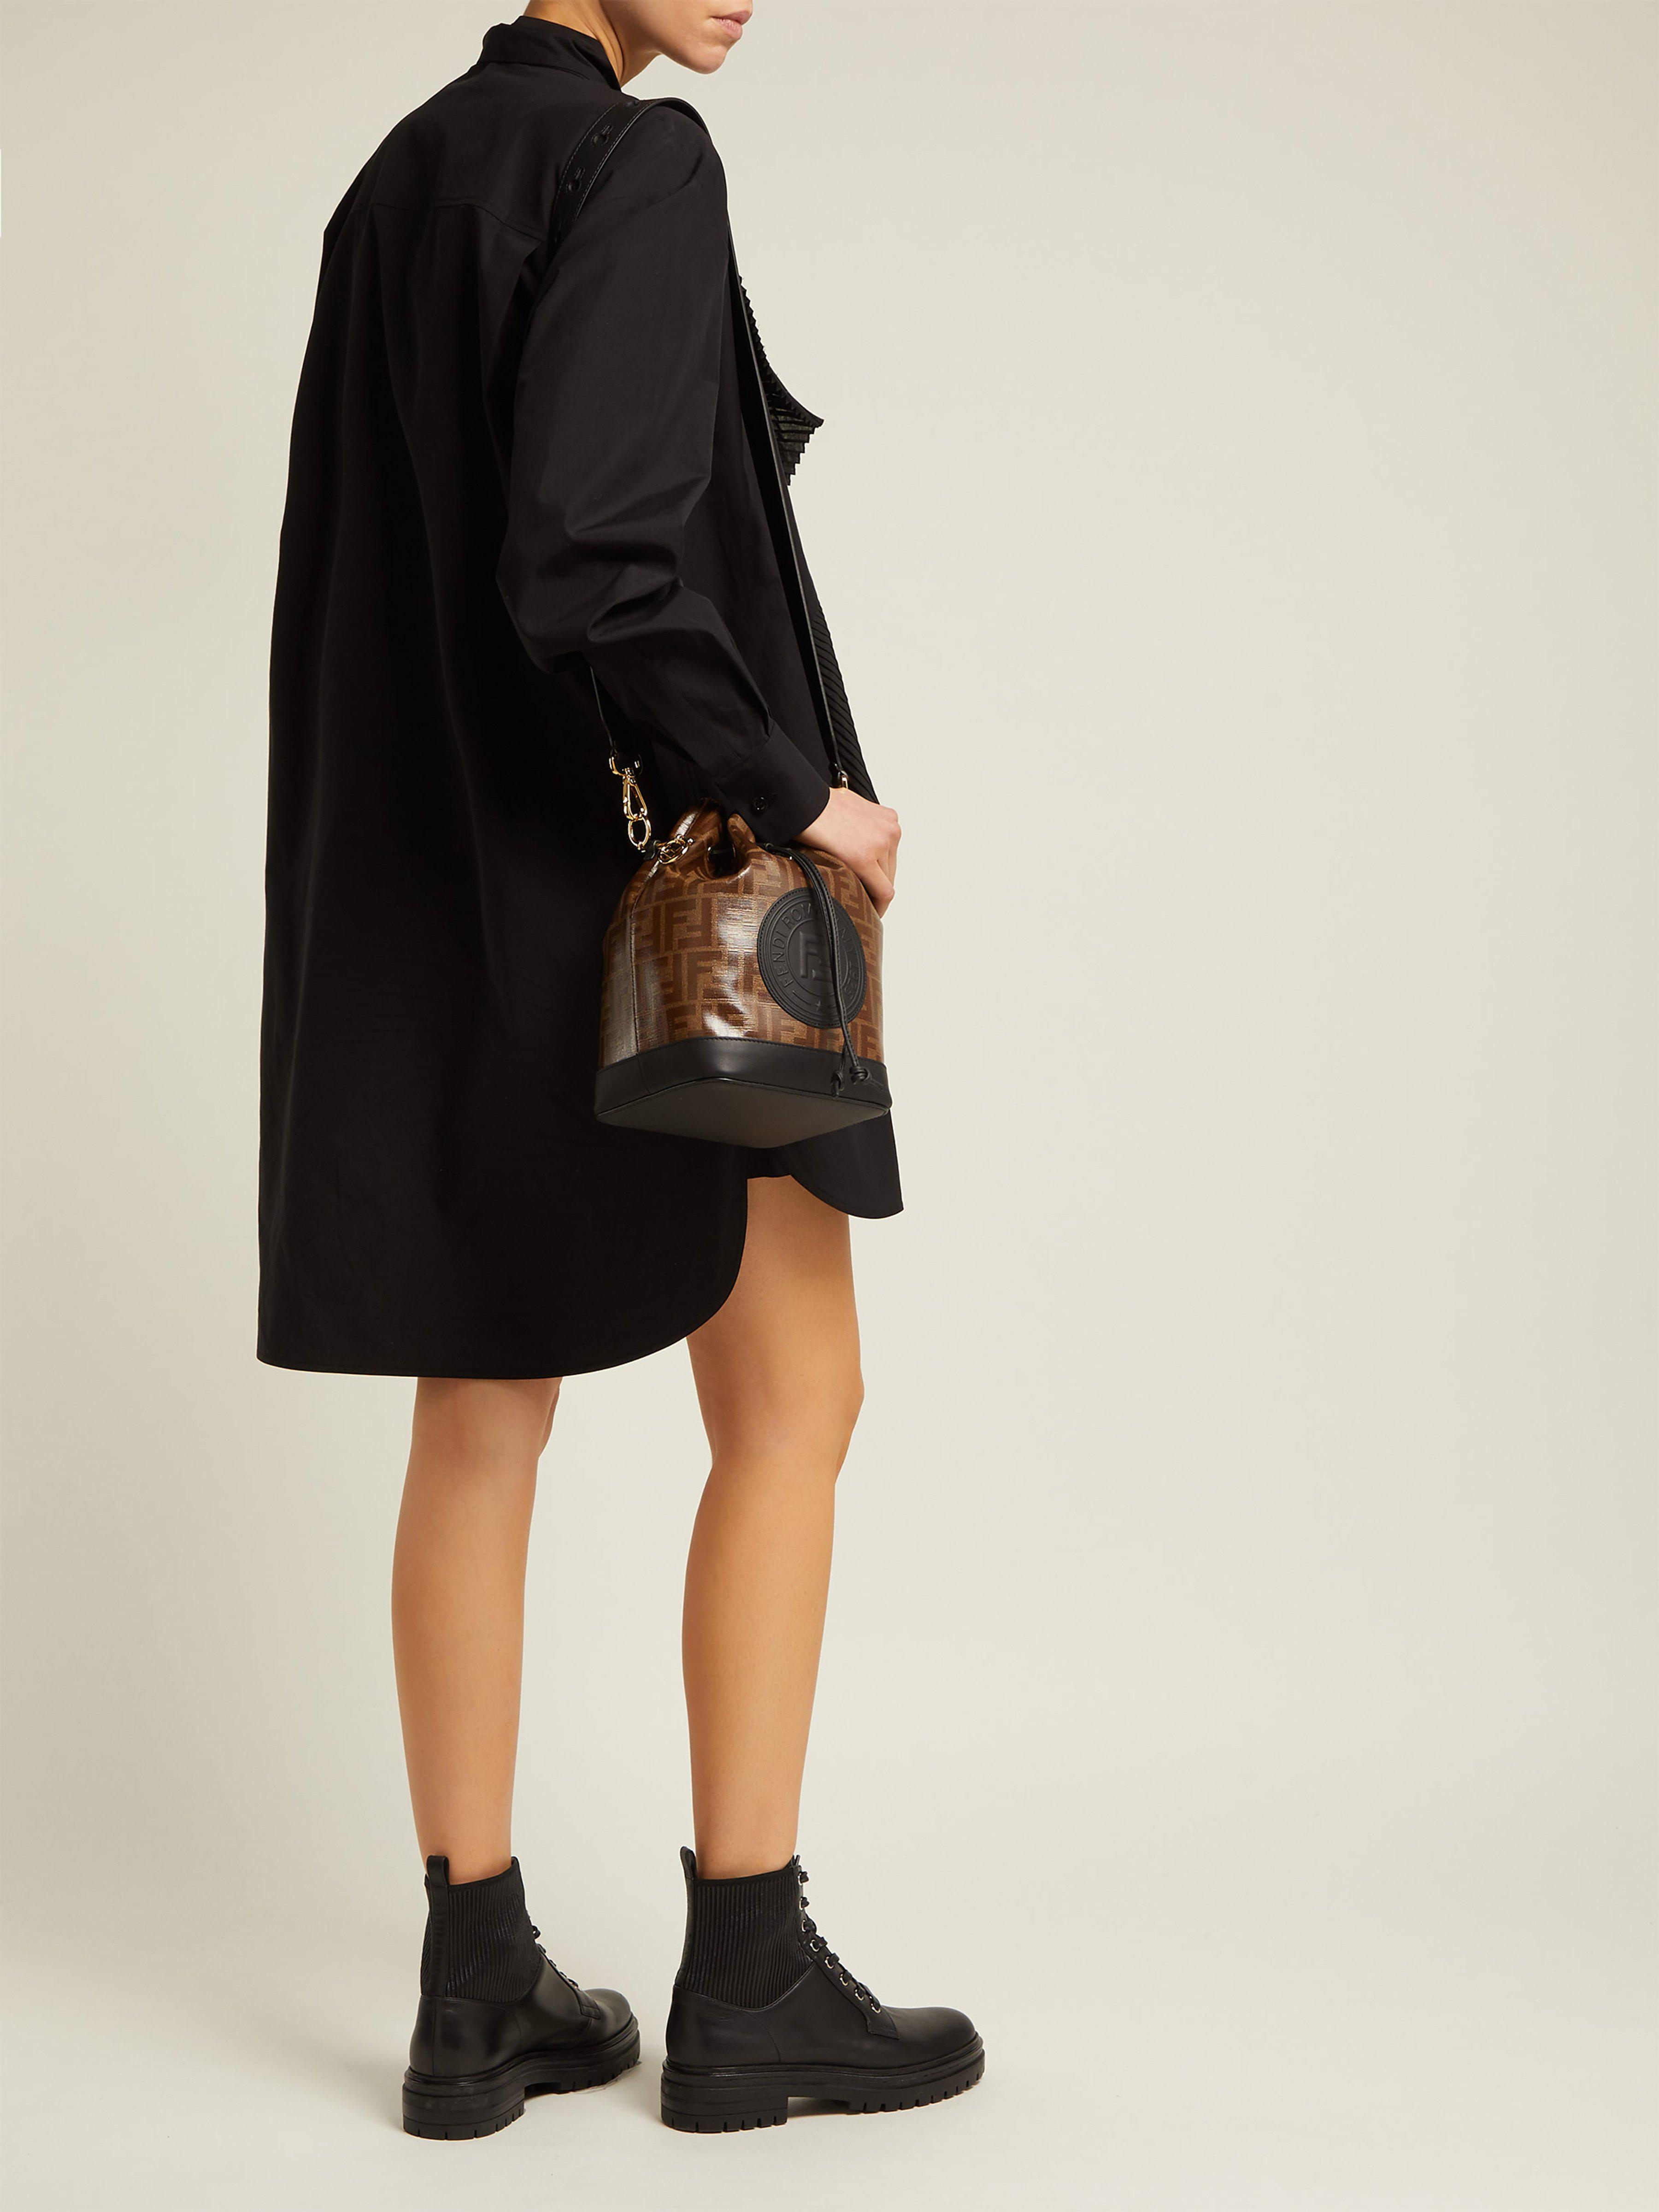 c2e9b34b3818 Fendi Mon Tresor Ff Jacquard Leather Bucket Bag in Brown - Lyst